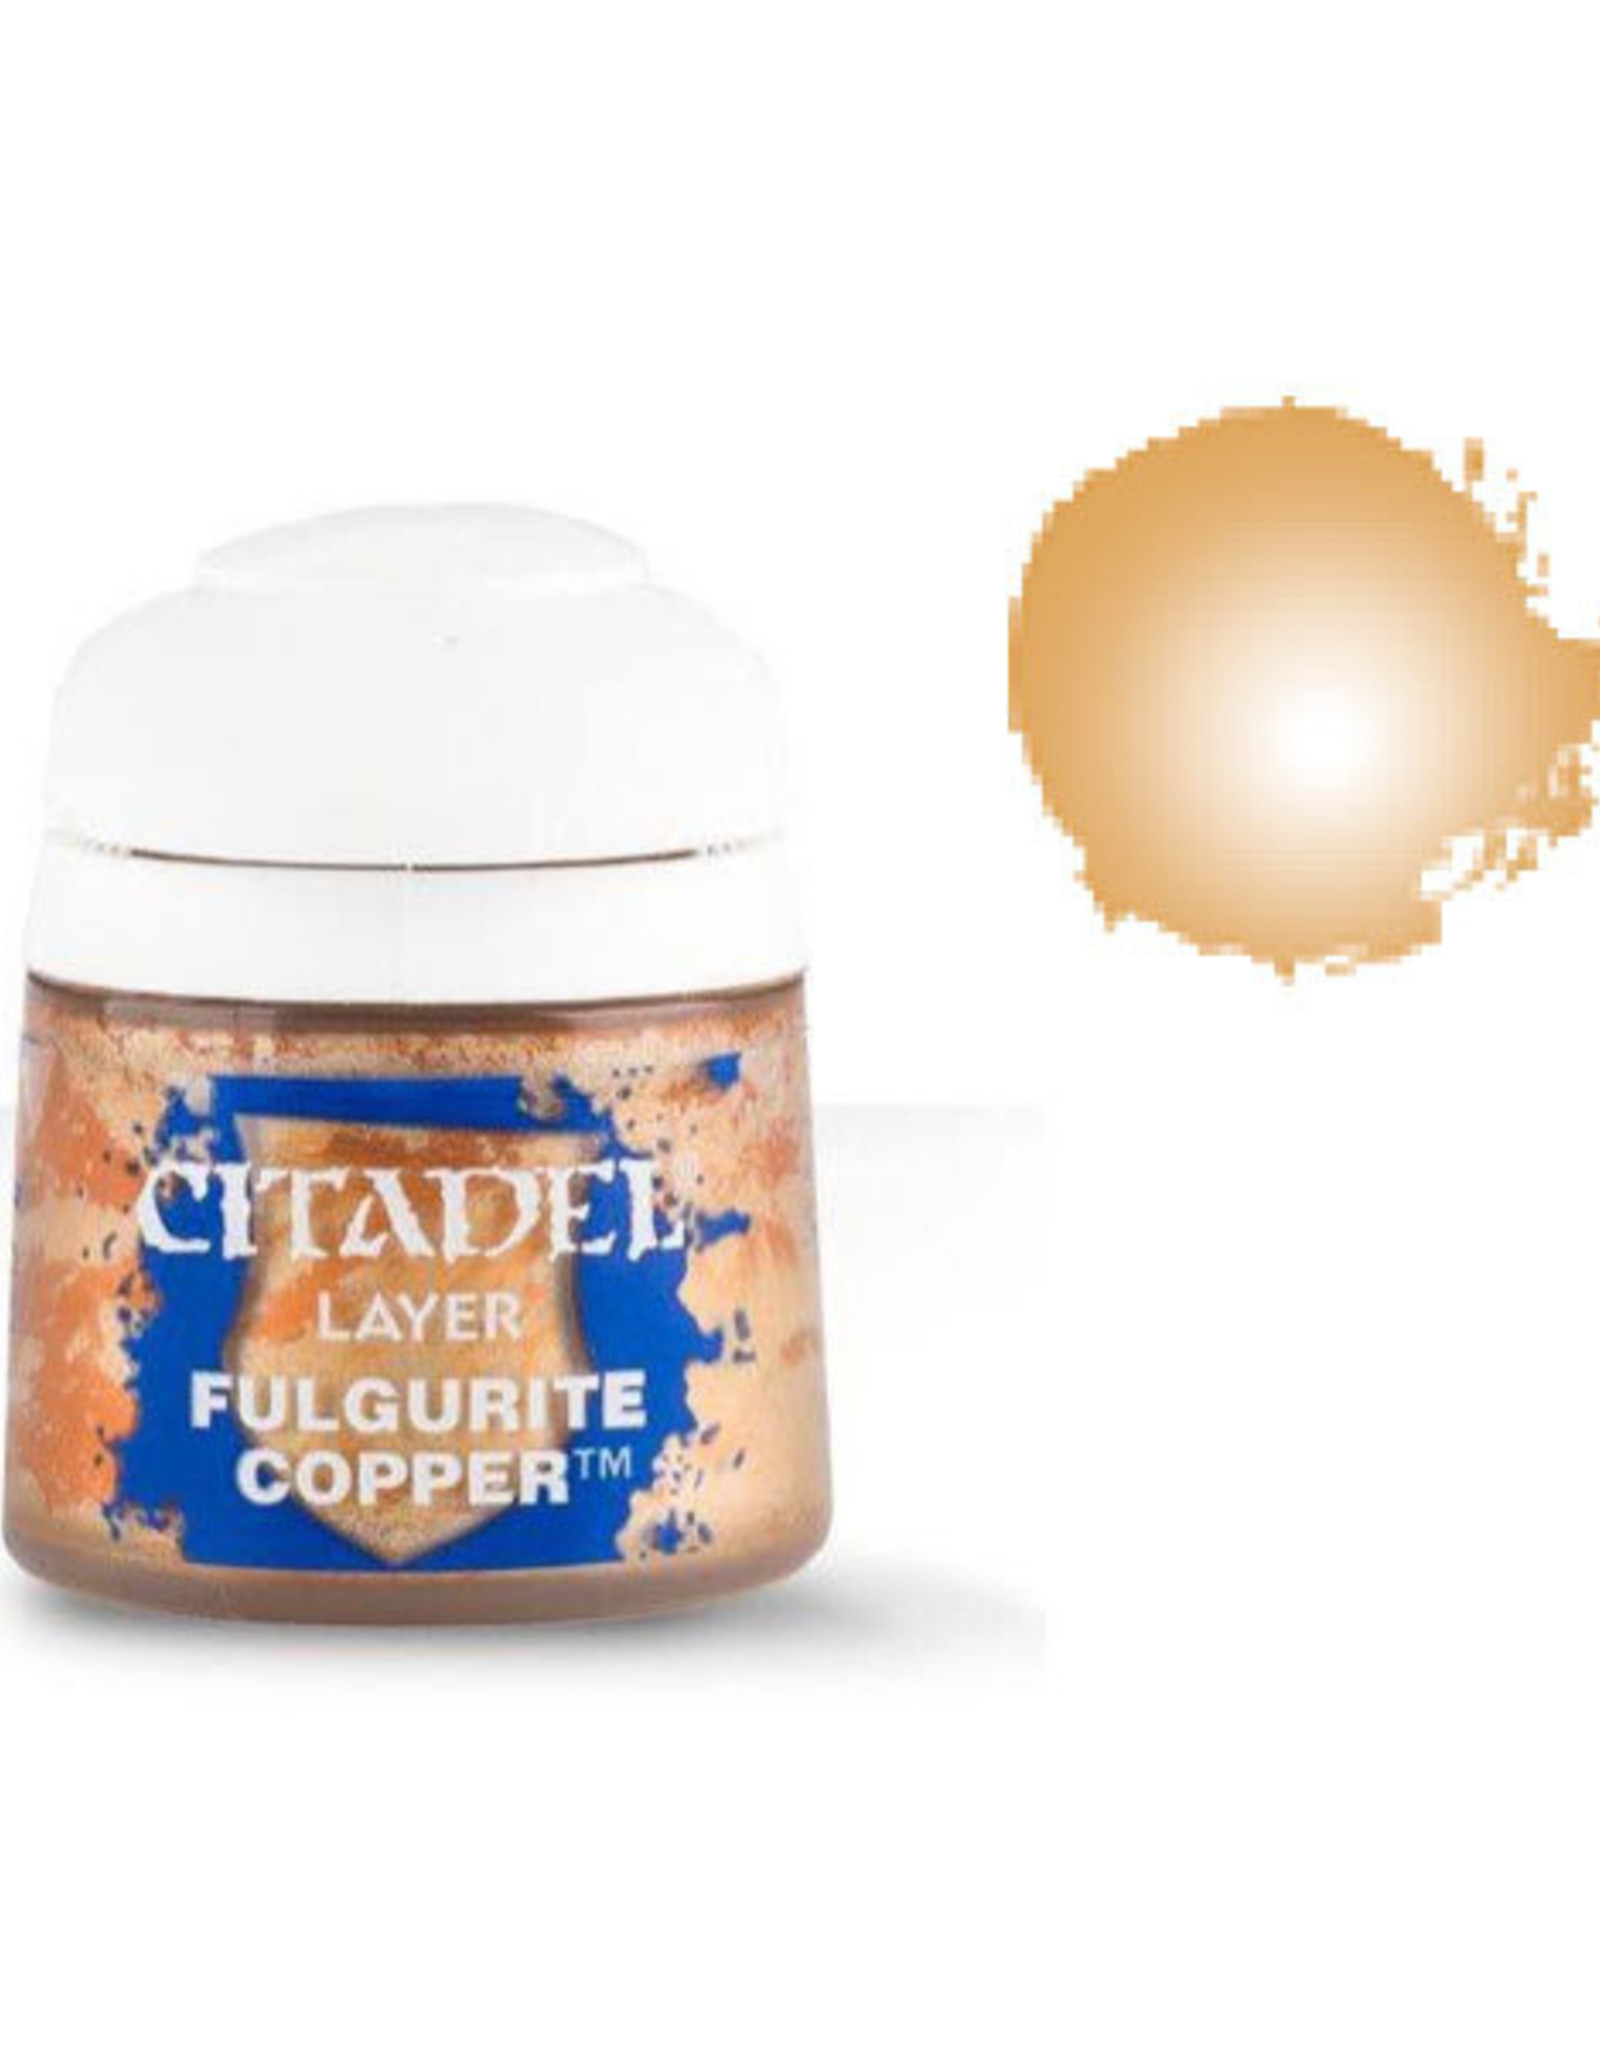 Games Workshop Citadel Paint: Layer - Fulgurite Copper